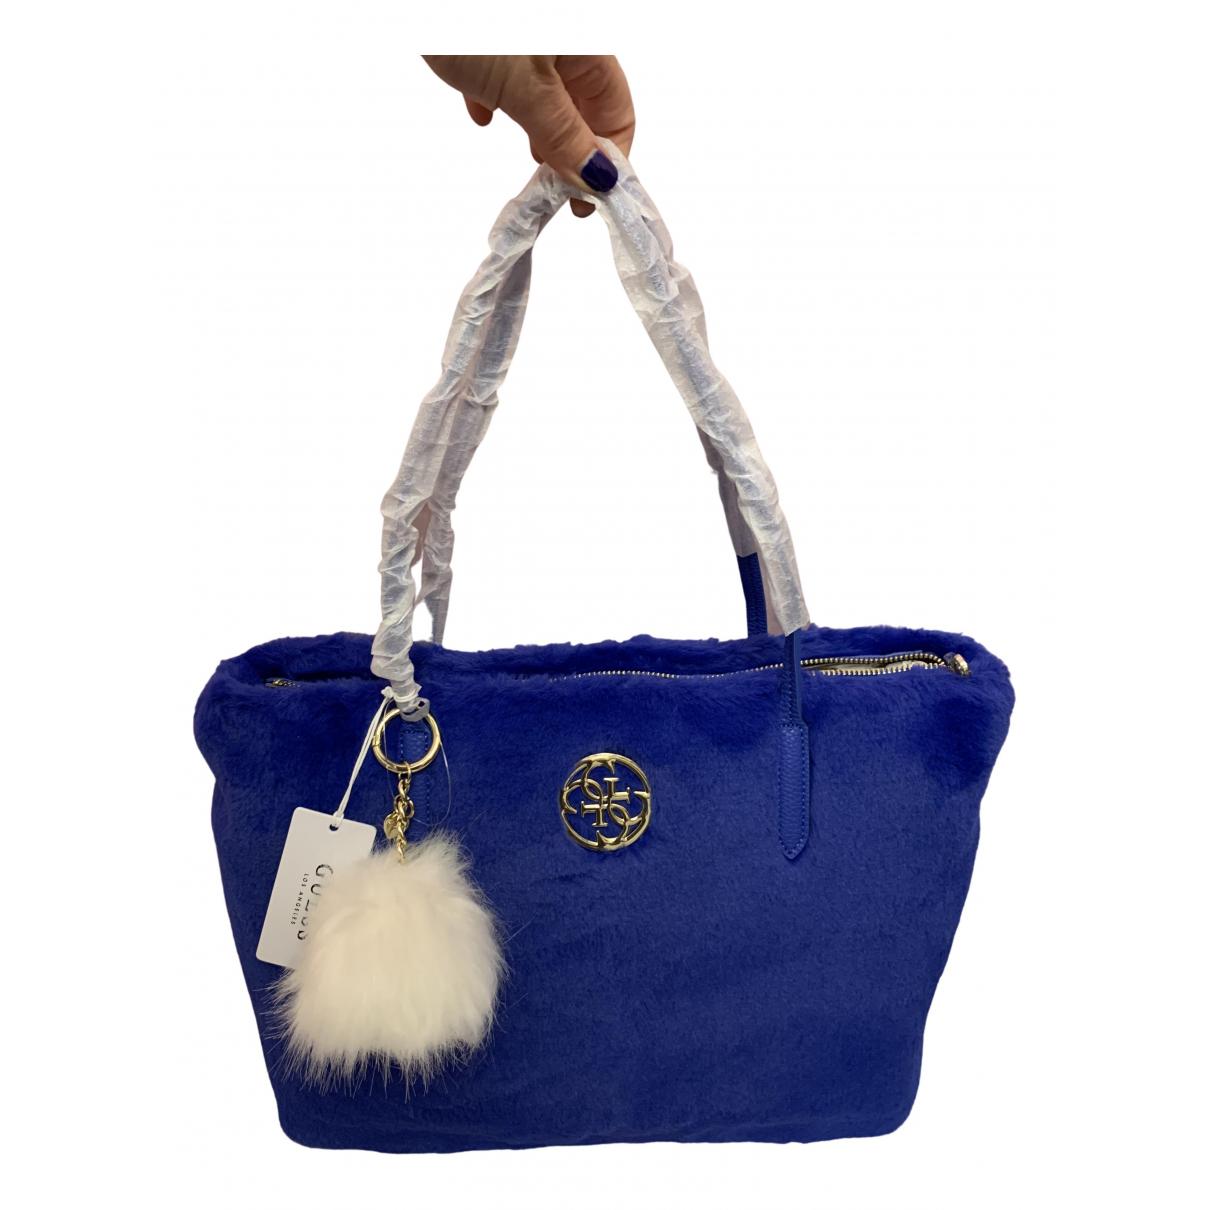 Guess \N Handtasche in  Blau Synthetikpelz